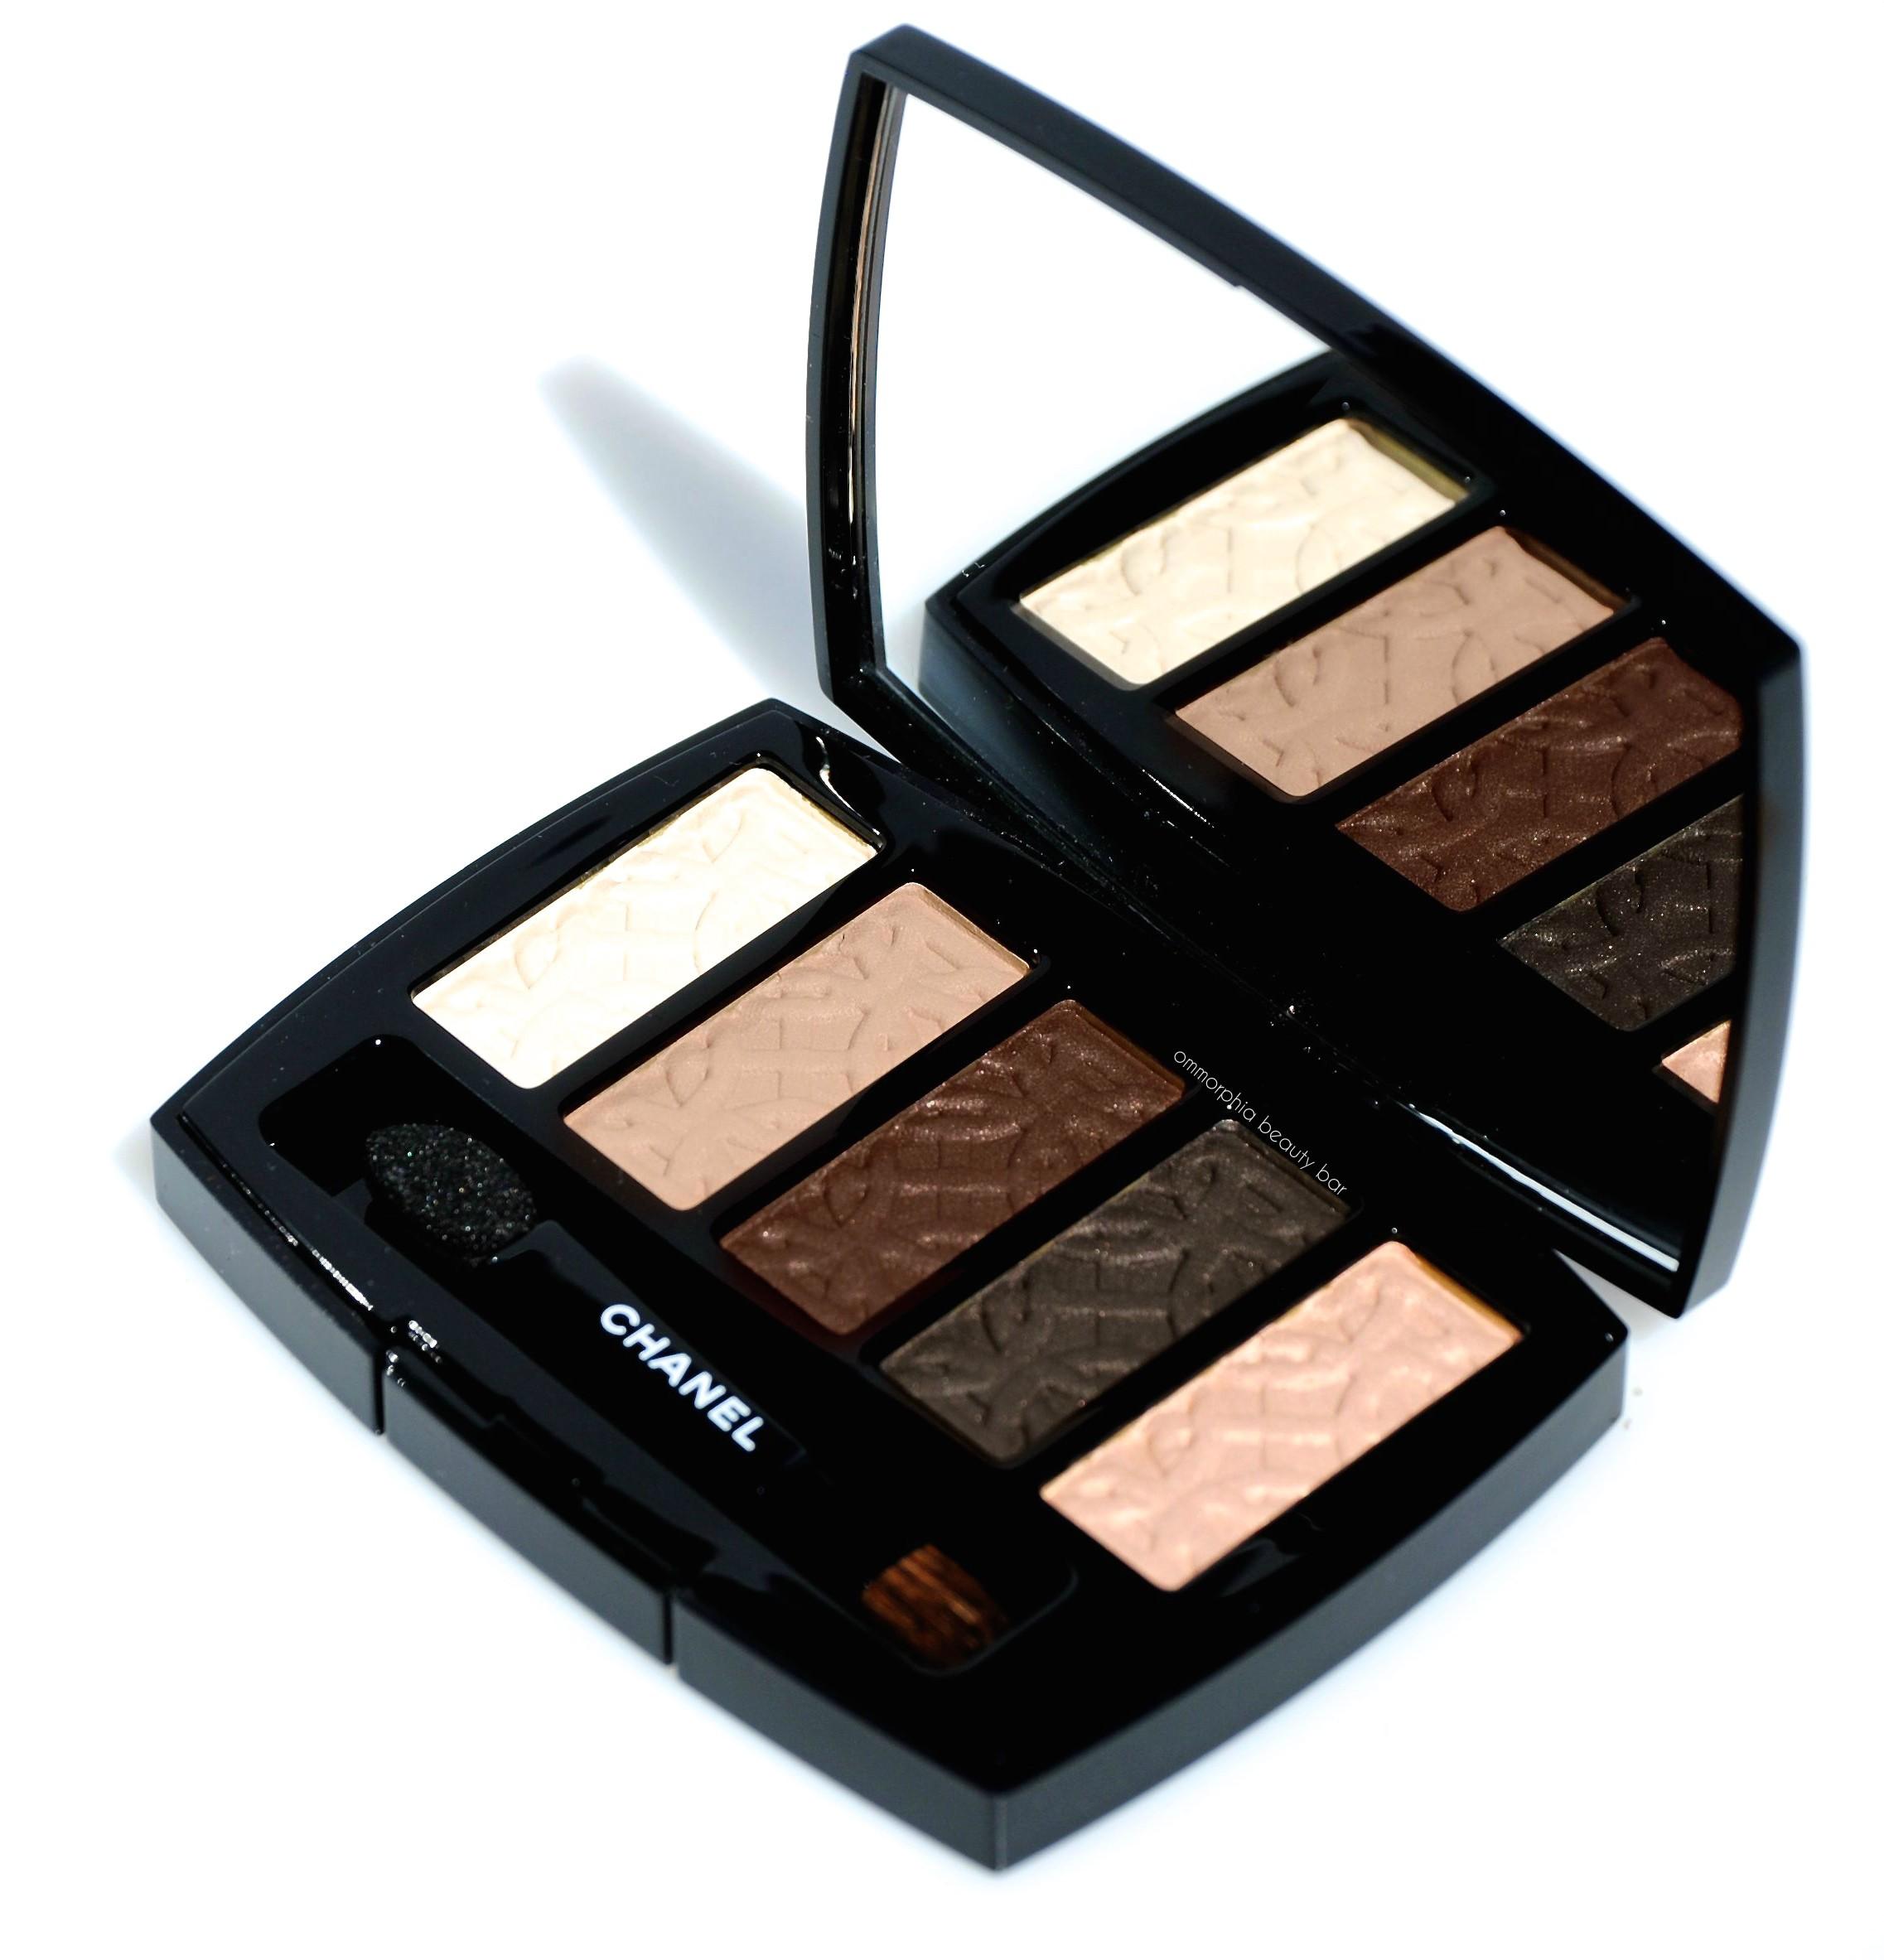 df56f8e4aec Entrelacs Eyeshadow Palette (Limited Edition)